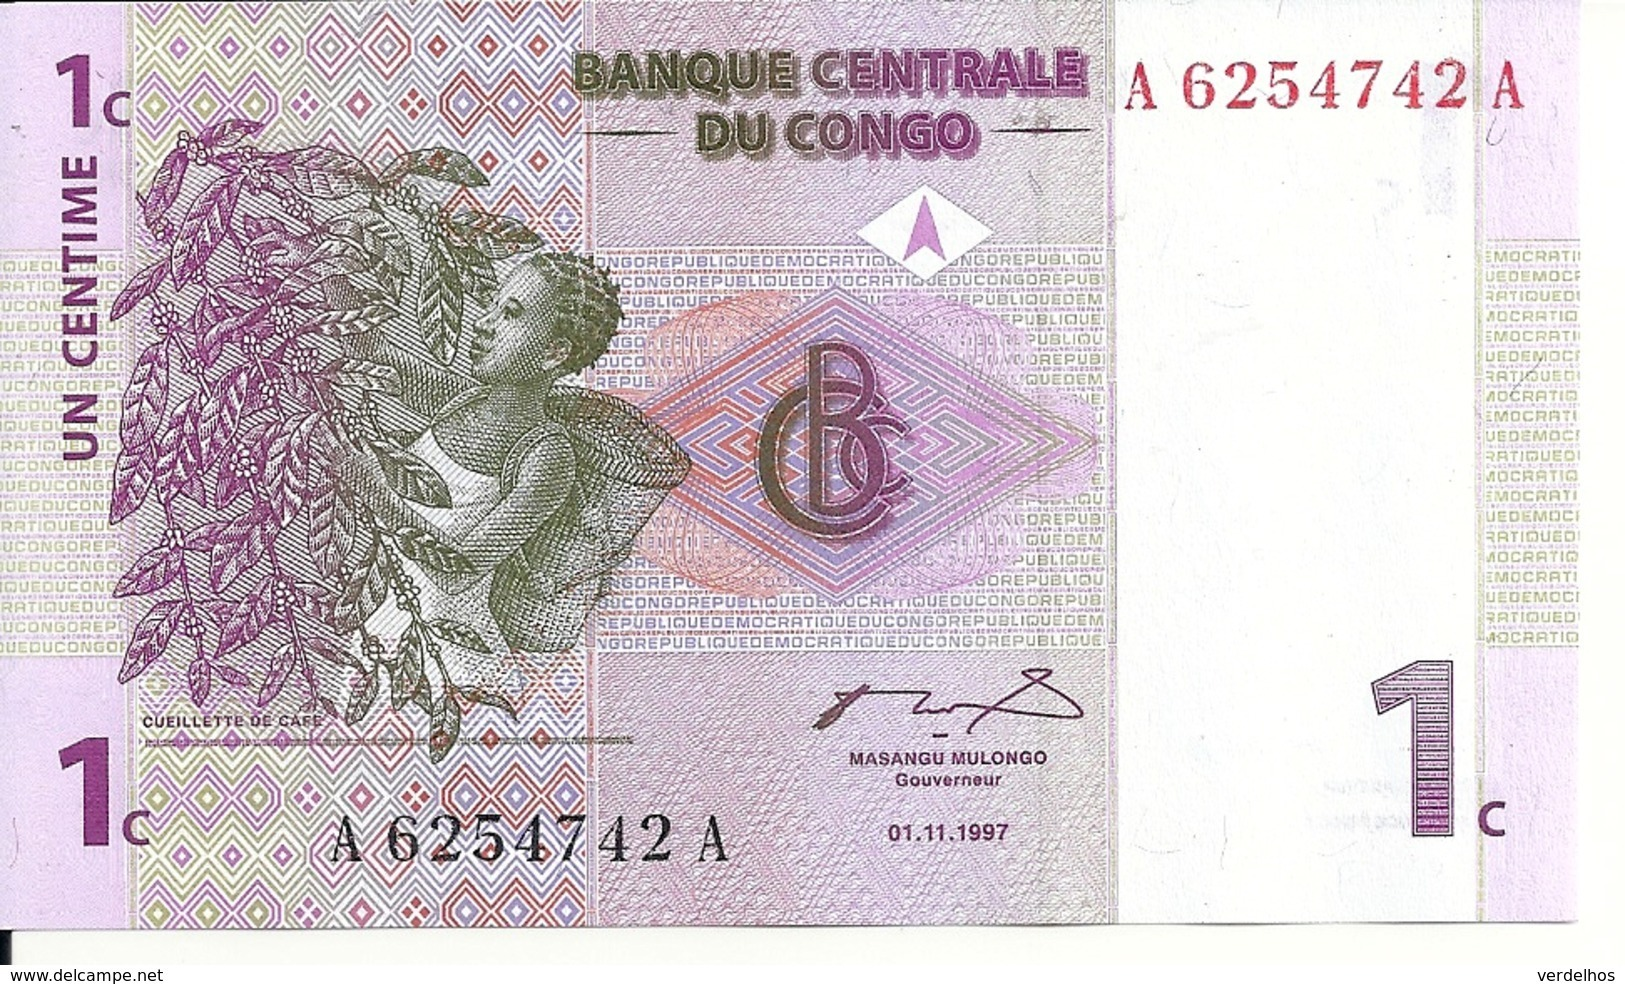 CONGO 1 CENTIME 1997 UNC P 80 - Zonder Classificatie